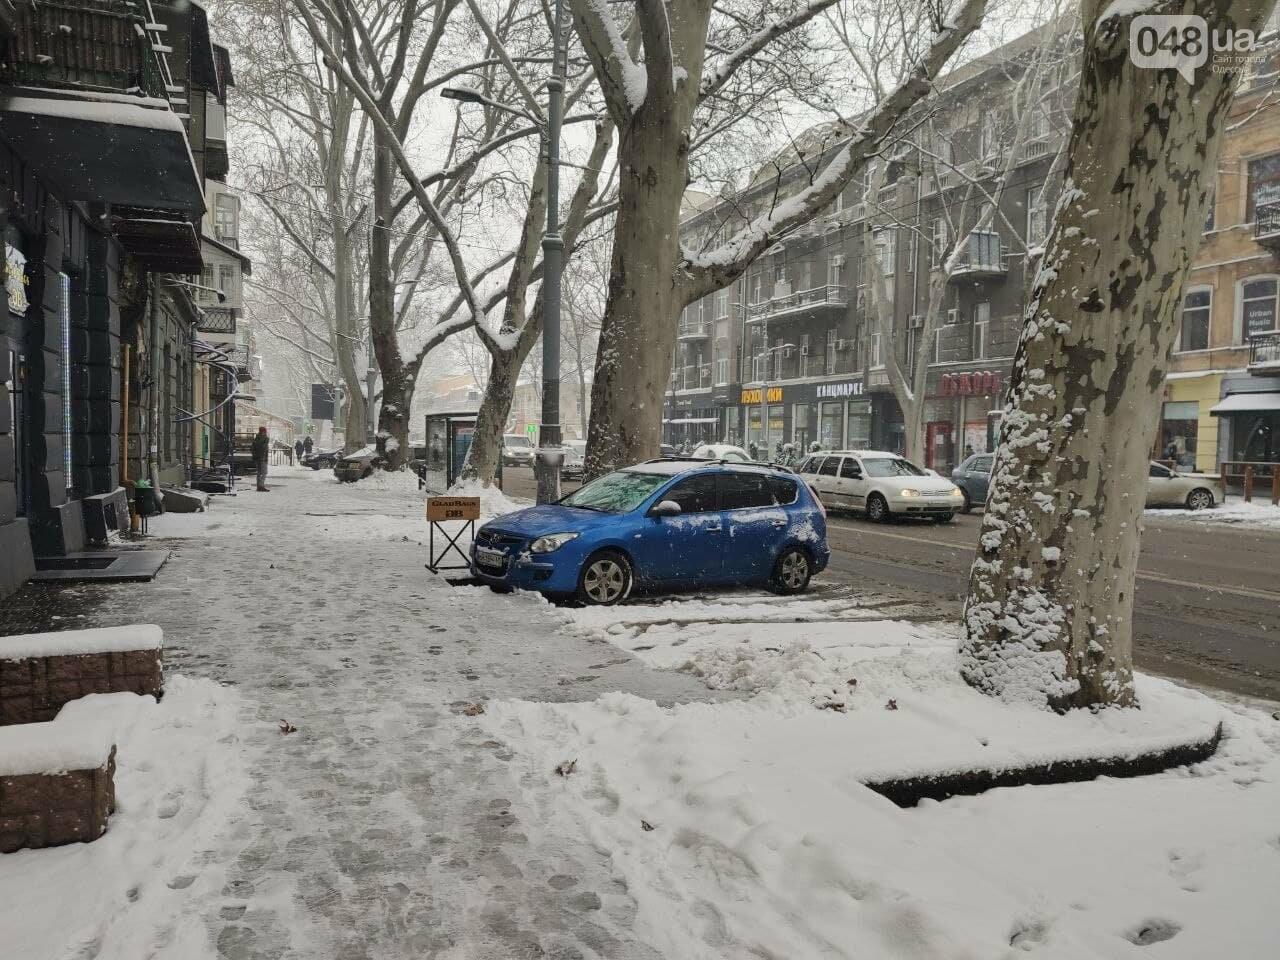 Одессу замело: ситуация на дорогах и тротуарах в городе, - ФОТО, фото-6